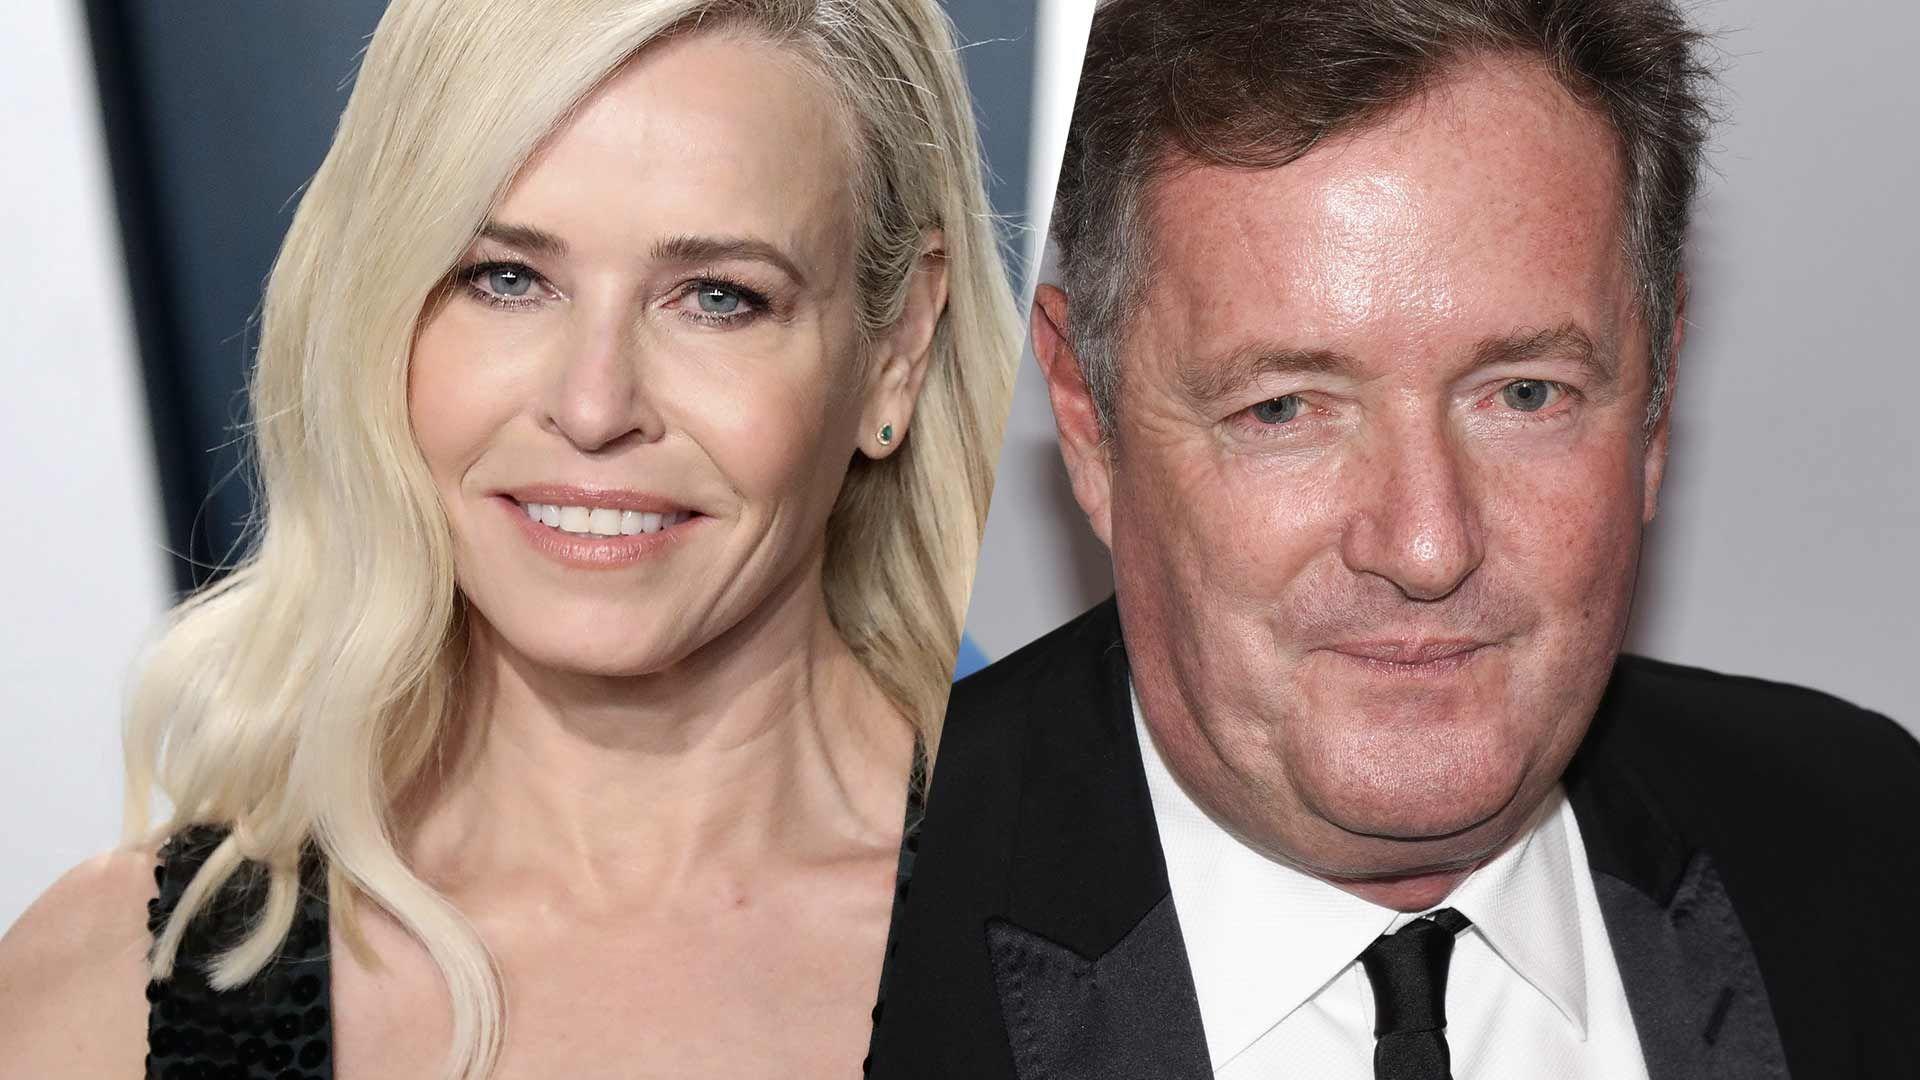 Chelsea Handler and Piers Morgan